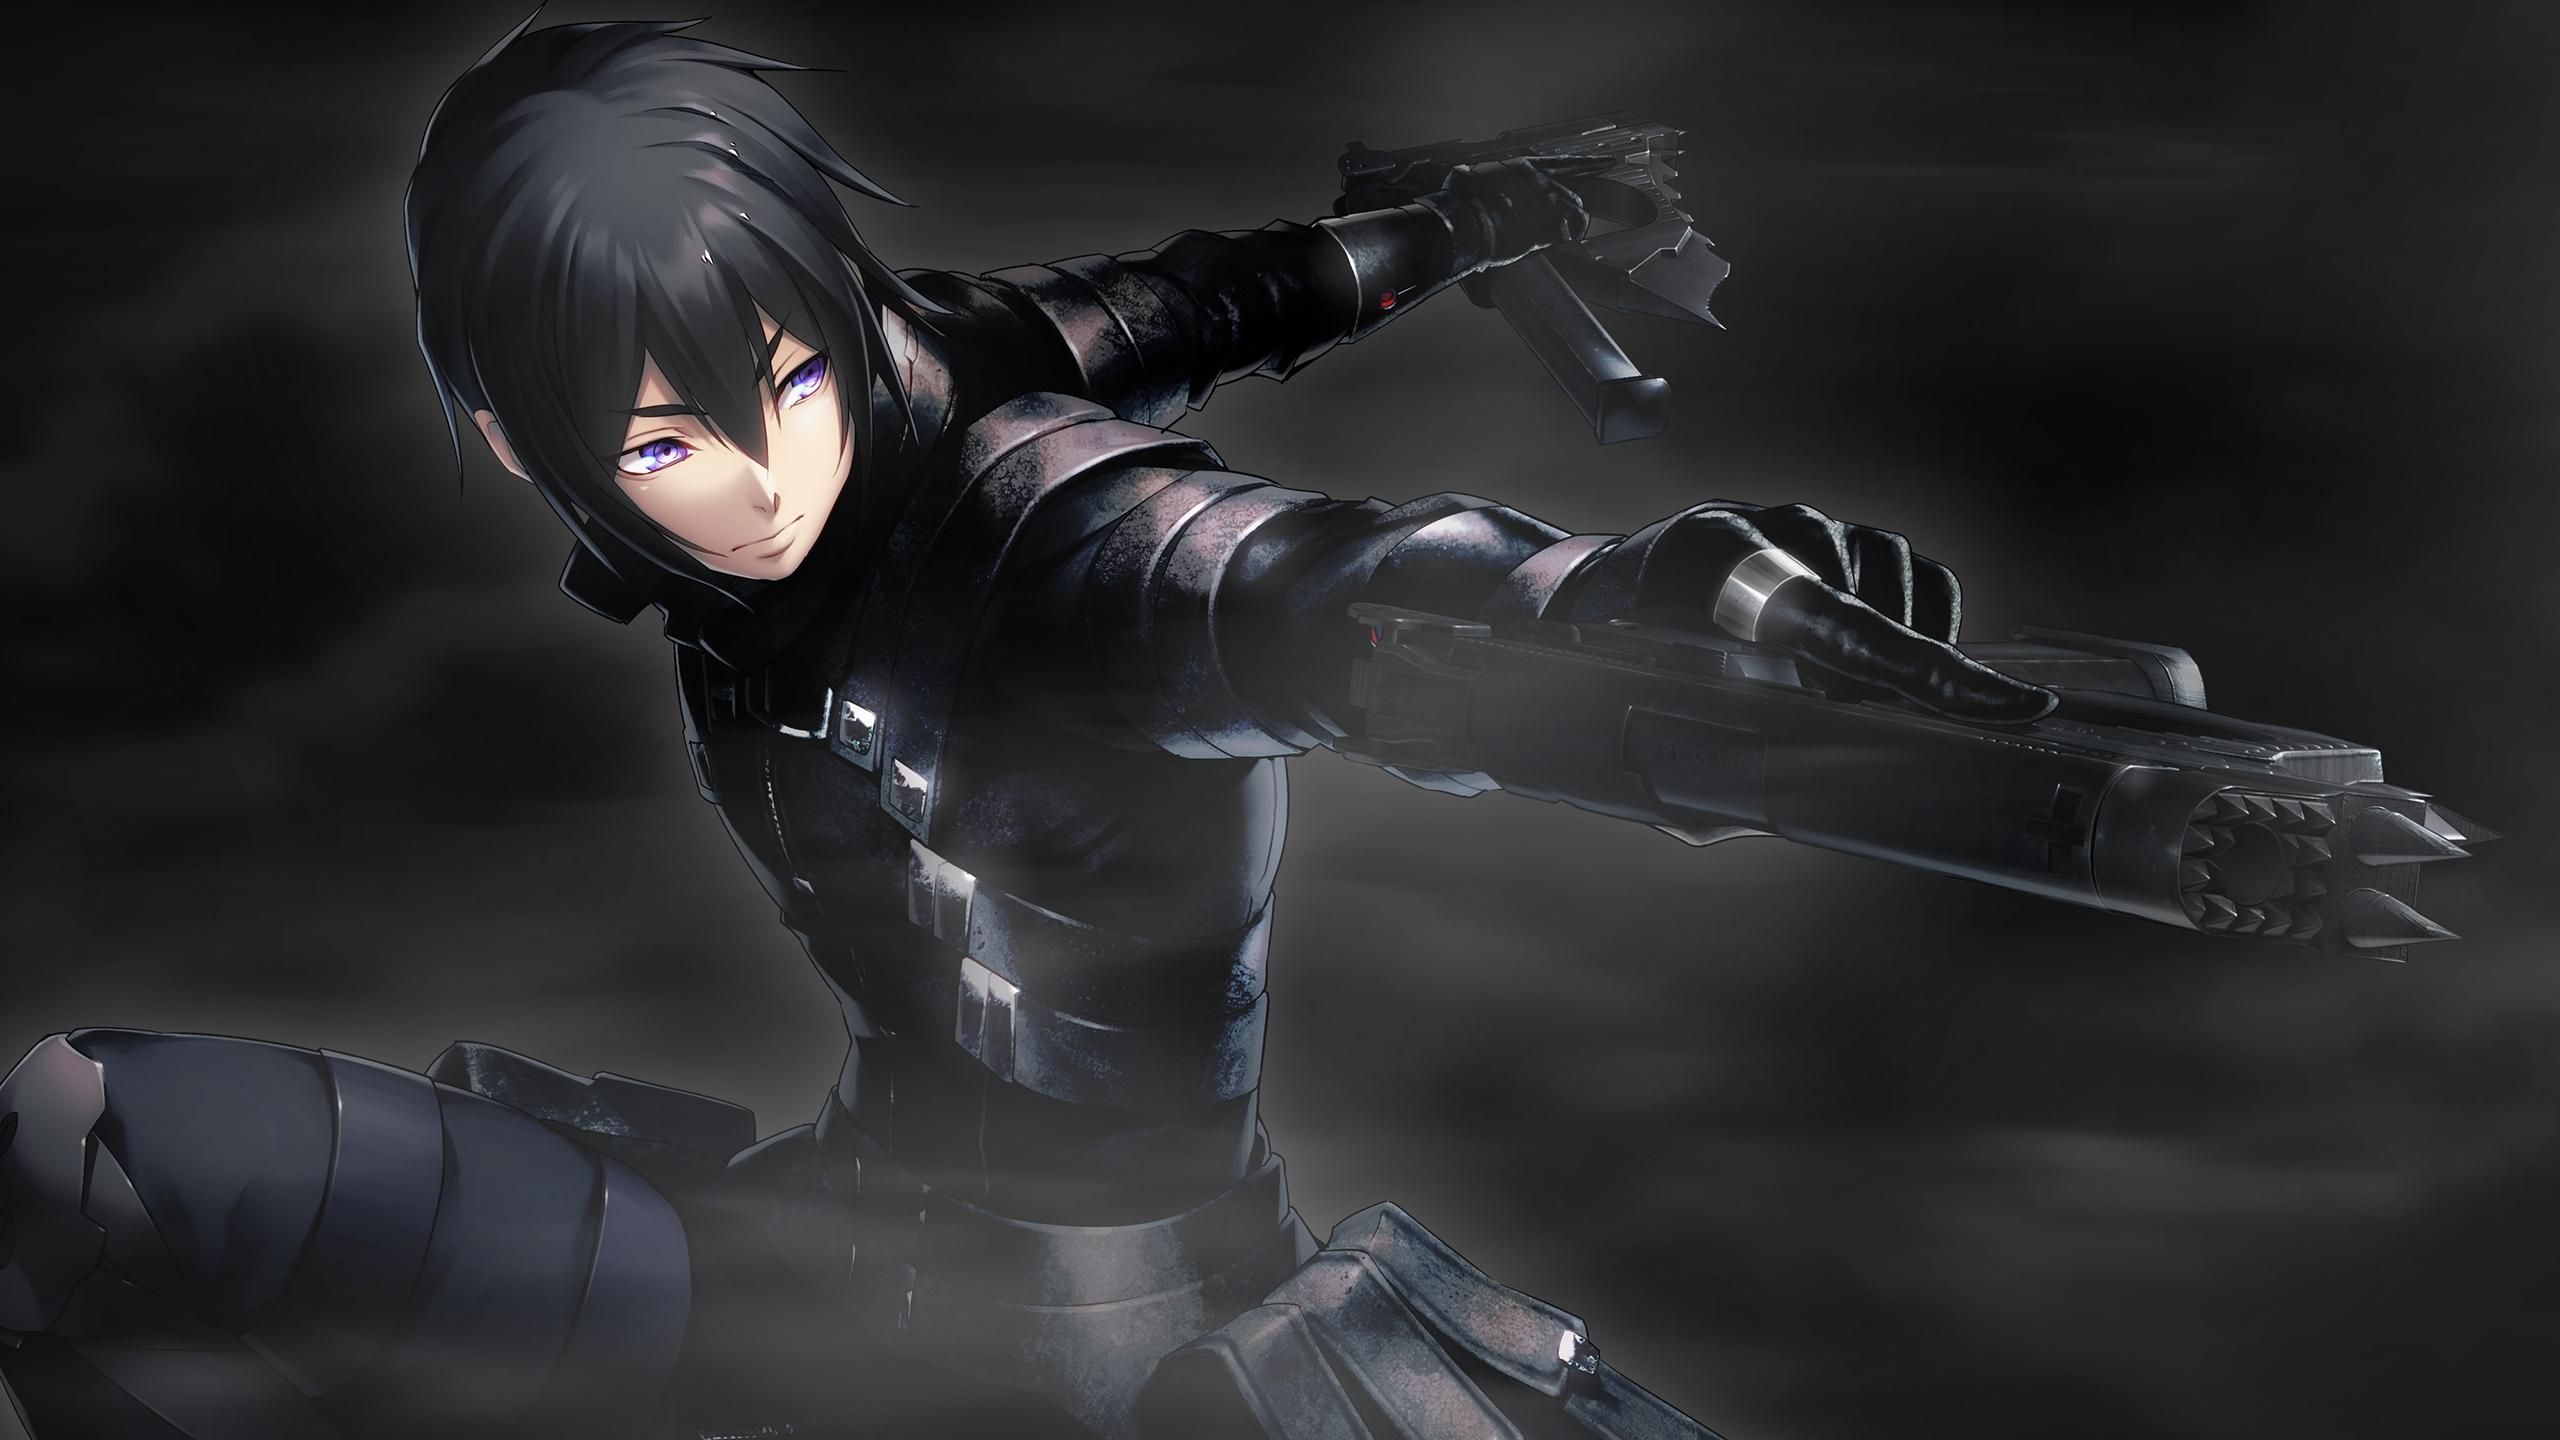 2560x1440 wallpaper Anime boy, game, dark, tokyo necro